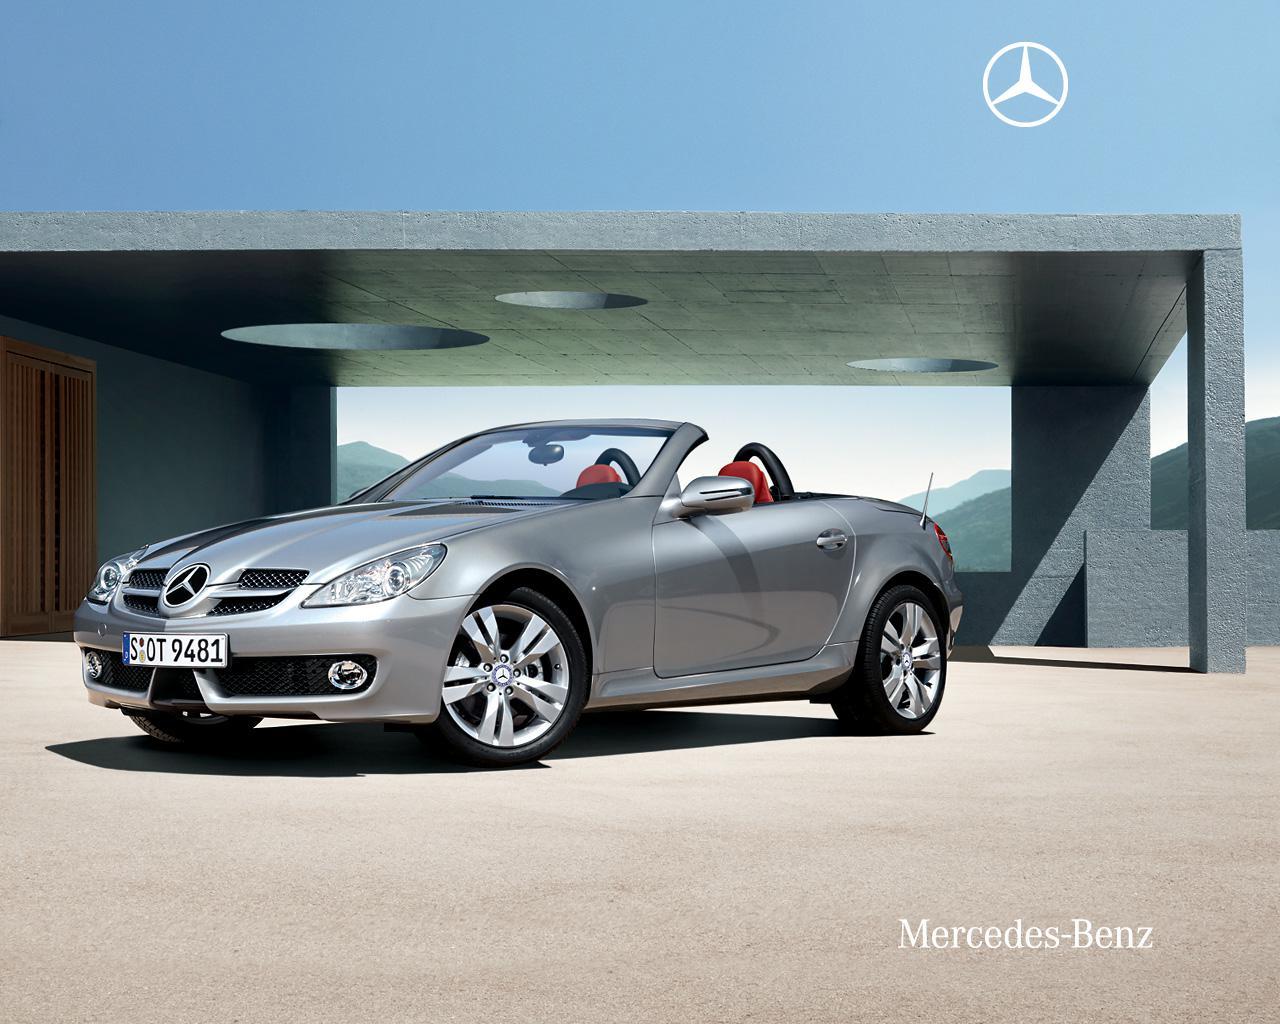 2009 Mercedes Benz SLK R171 280